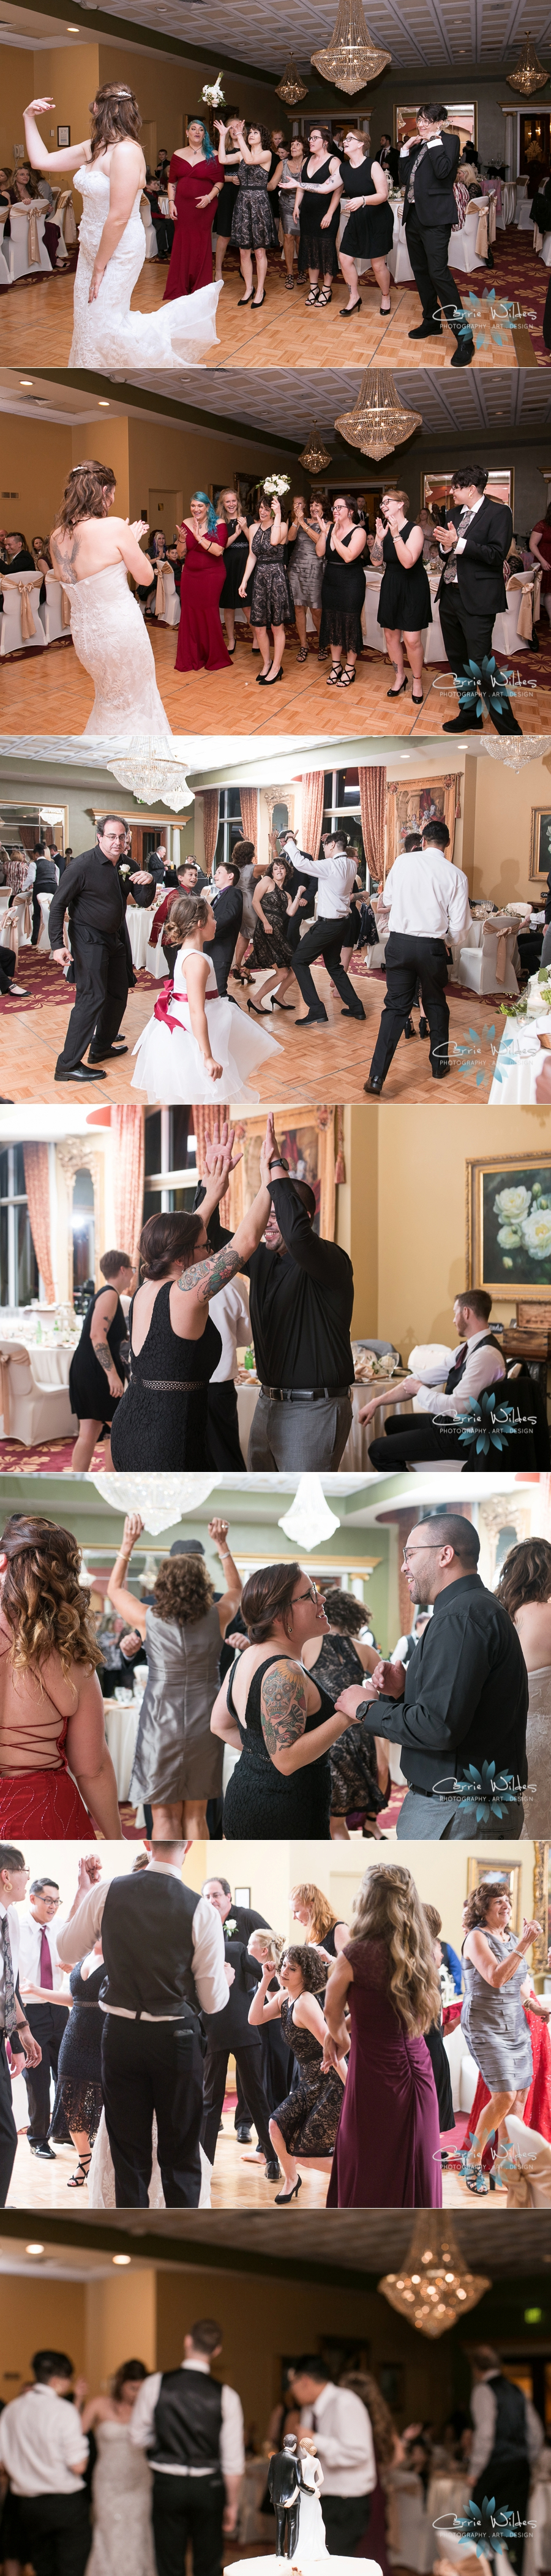 1_19_19 Alyx and Billy Safety Harbor Resort Wedding 00034.jpg